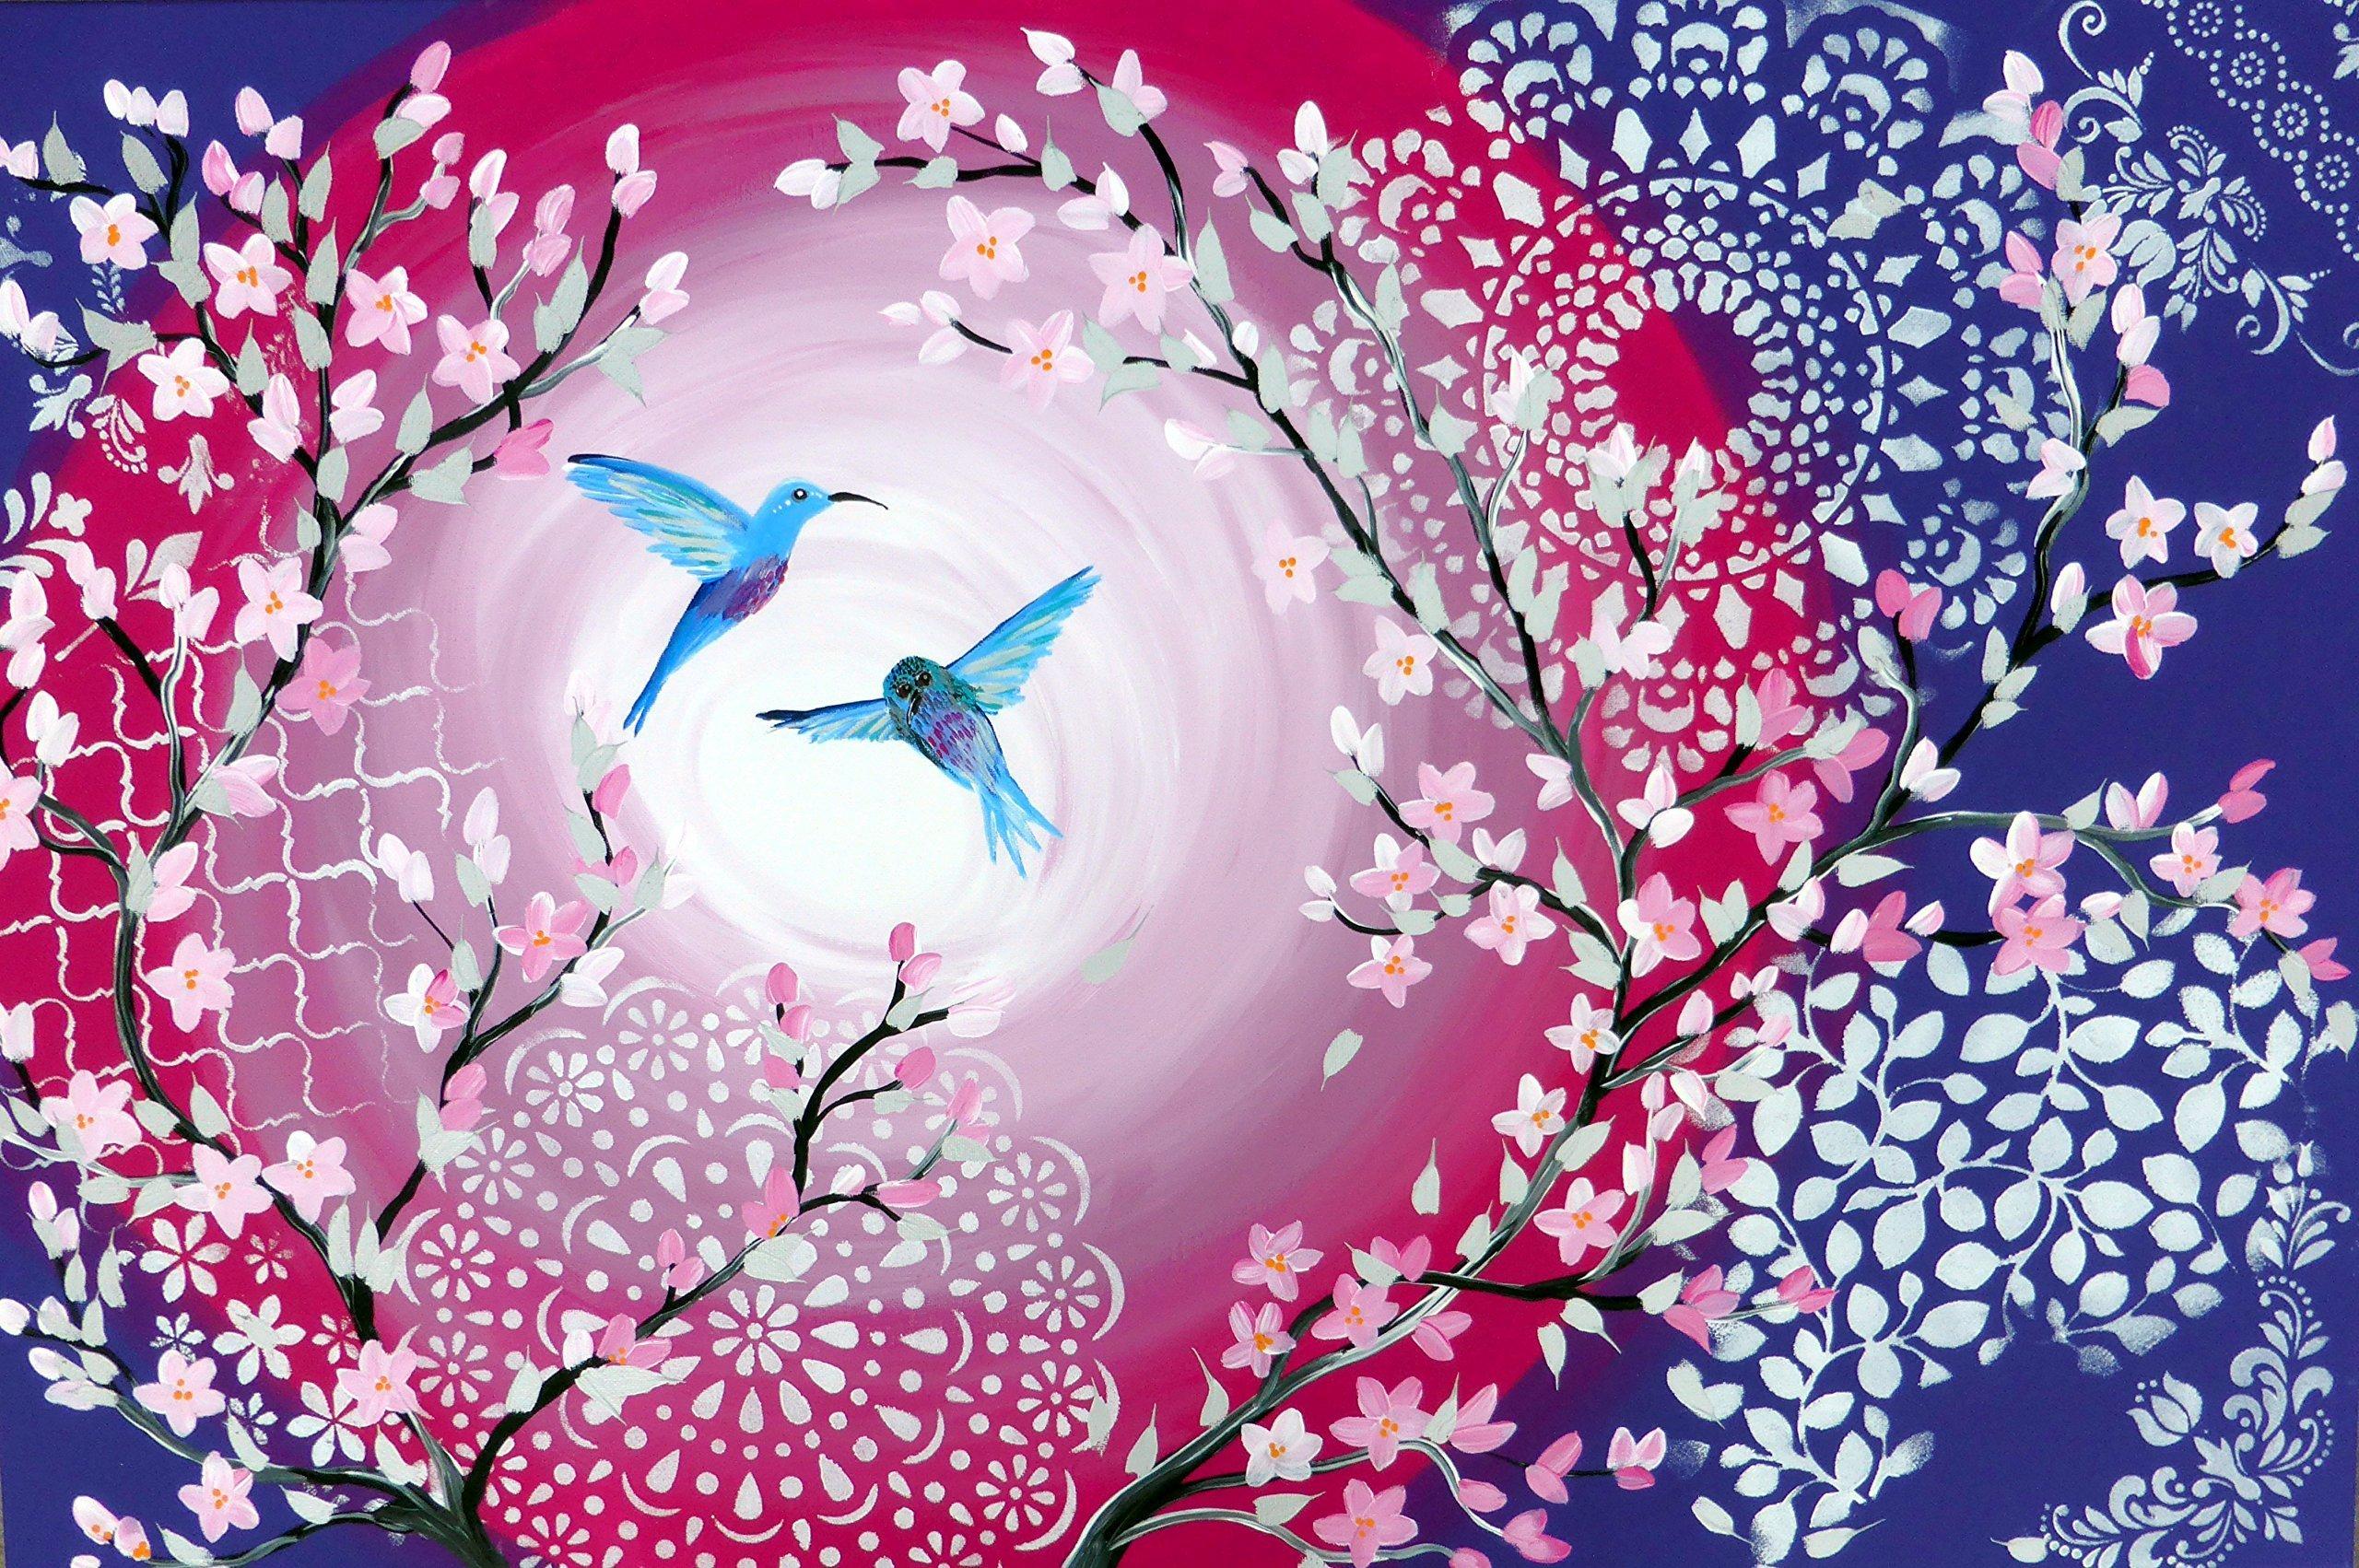 hummingbird painting, romantic gift, unusual wedding gift, wedding gifts, with hummingbirds, hummingbird present, hummingbird art, hummingbird painted, on canvas, hummingbird paintings on, canvas by Sheer Joy